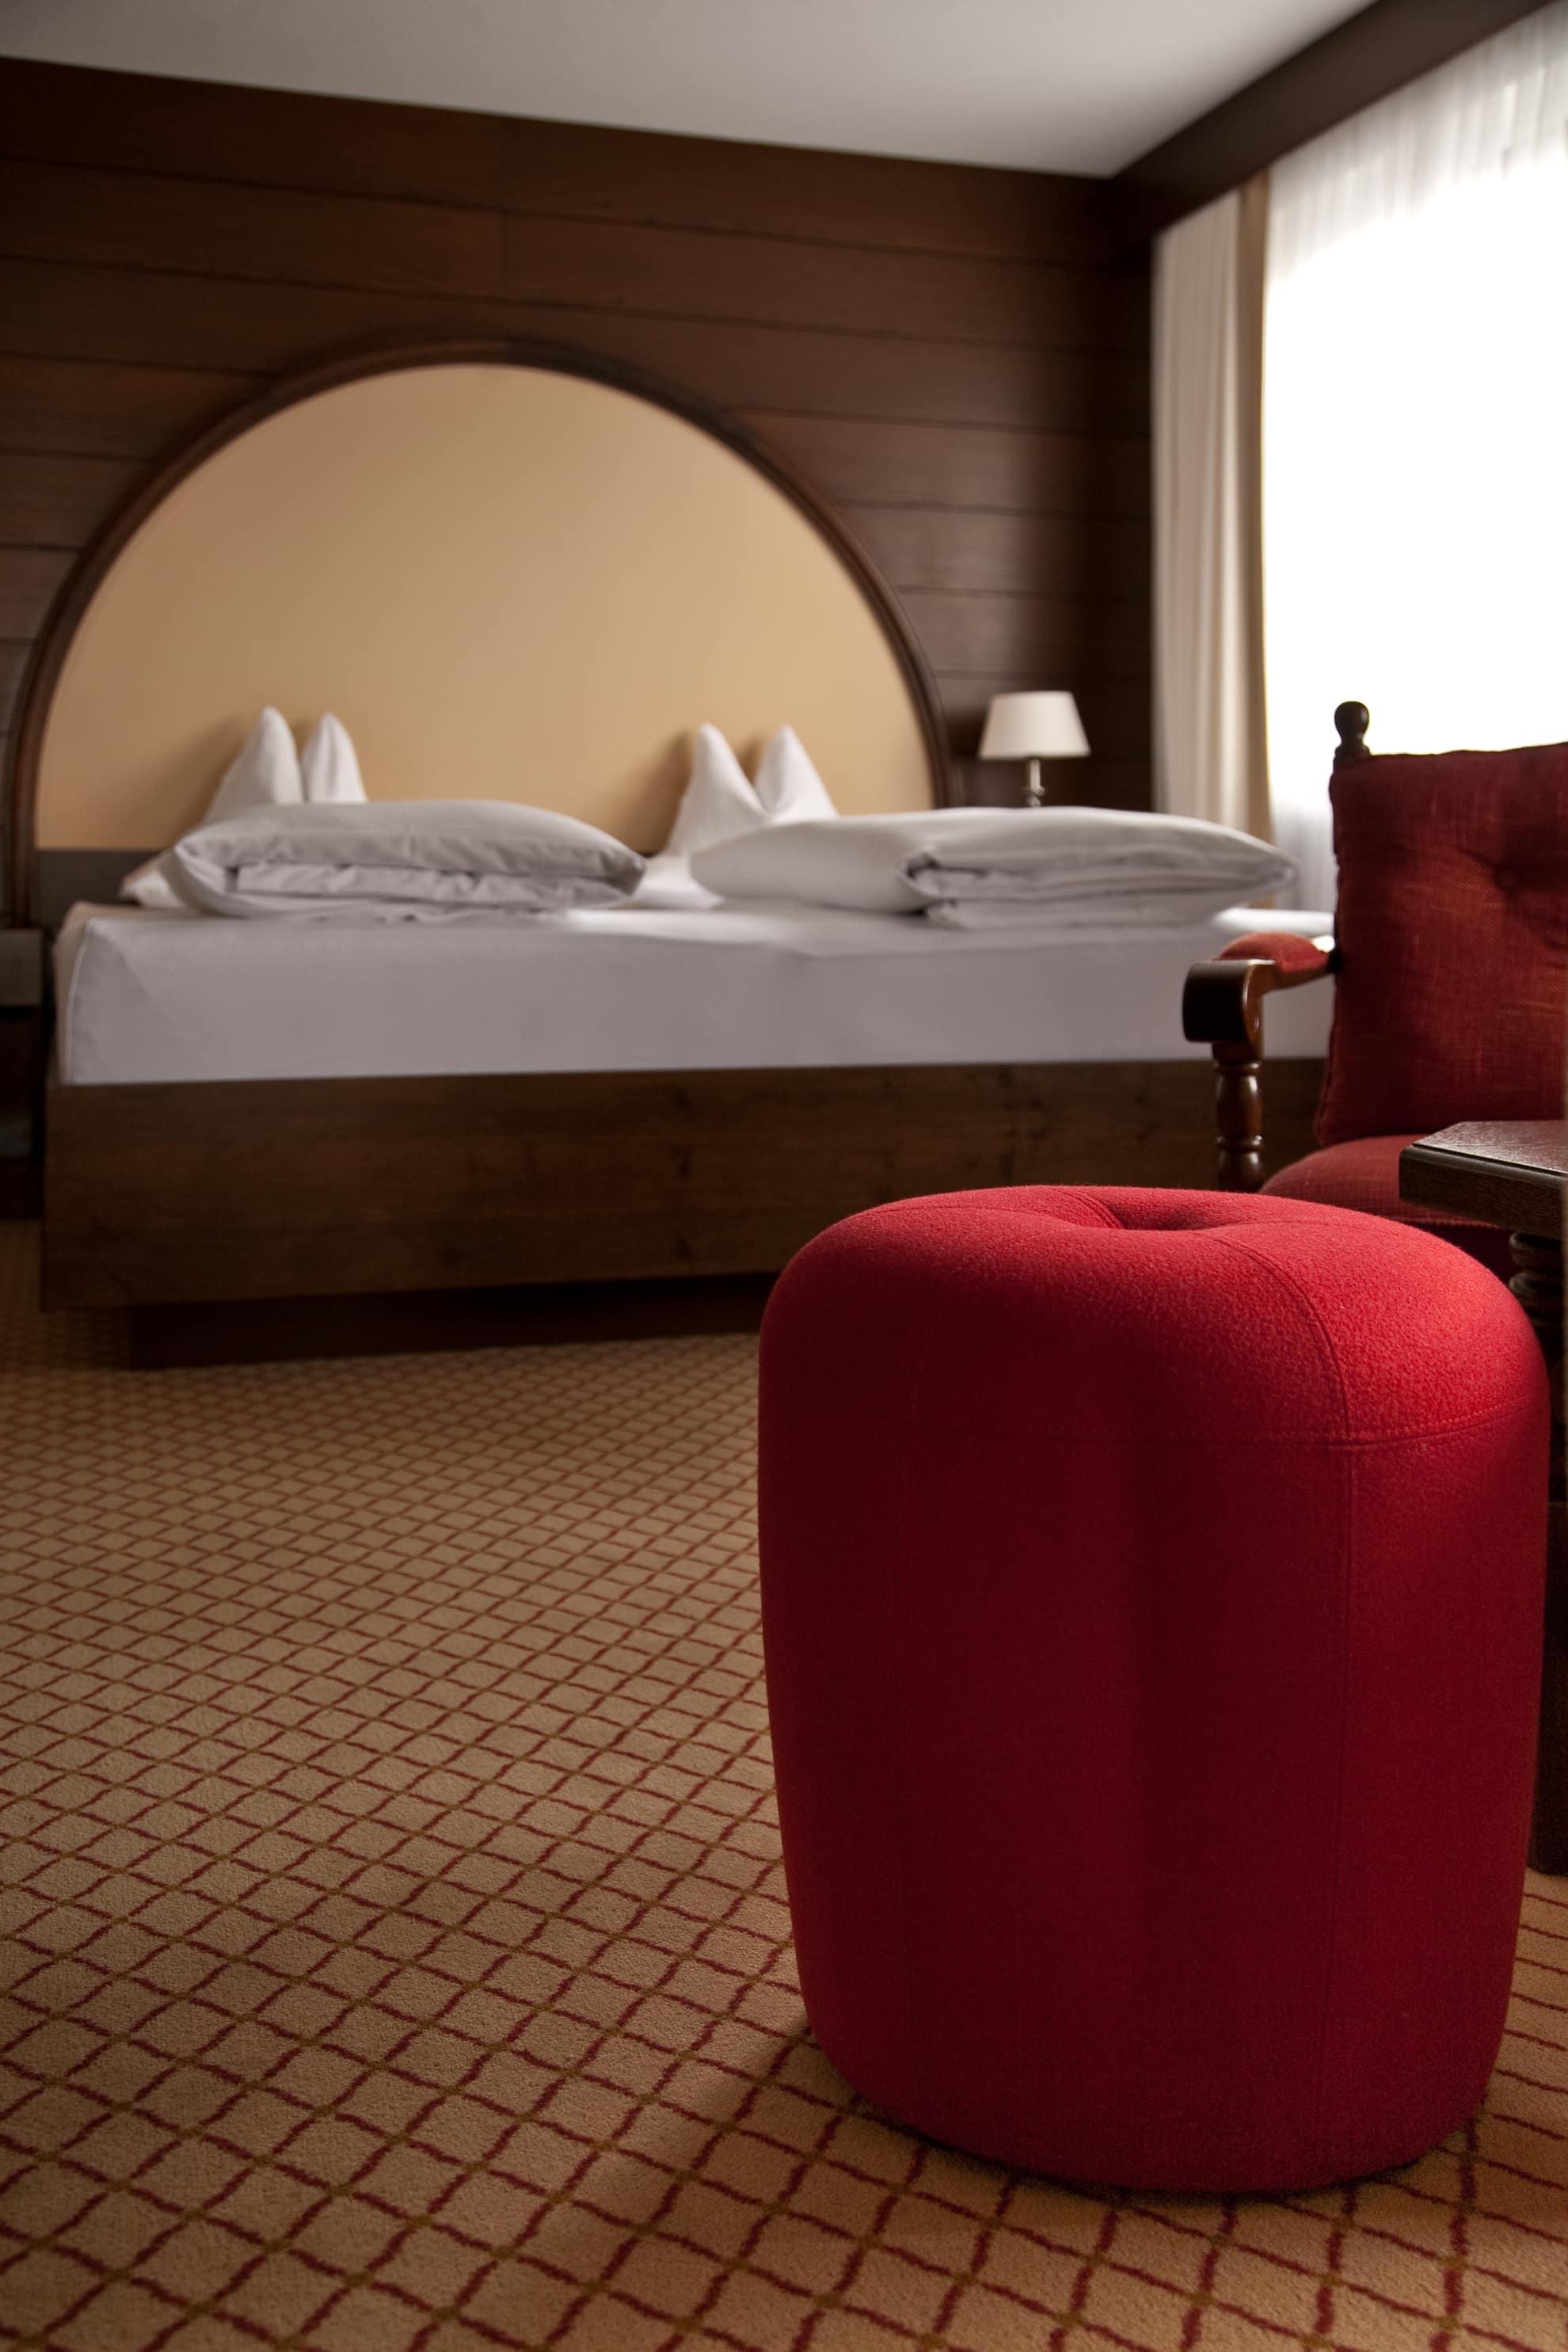 zimmer-kategorien-1-old-style-chick-hotel-flexen-zuers-am-arlberg